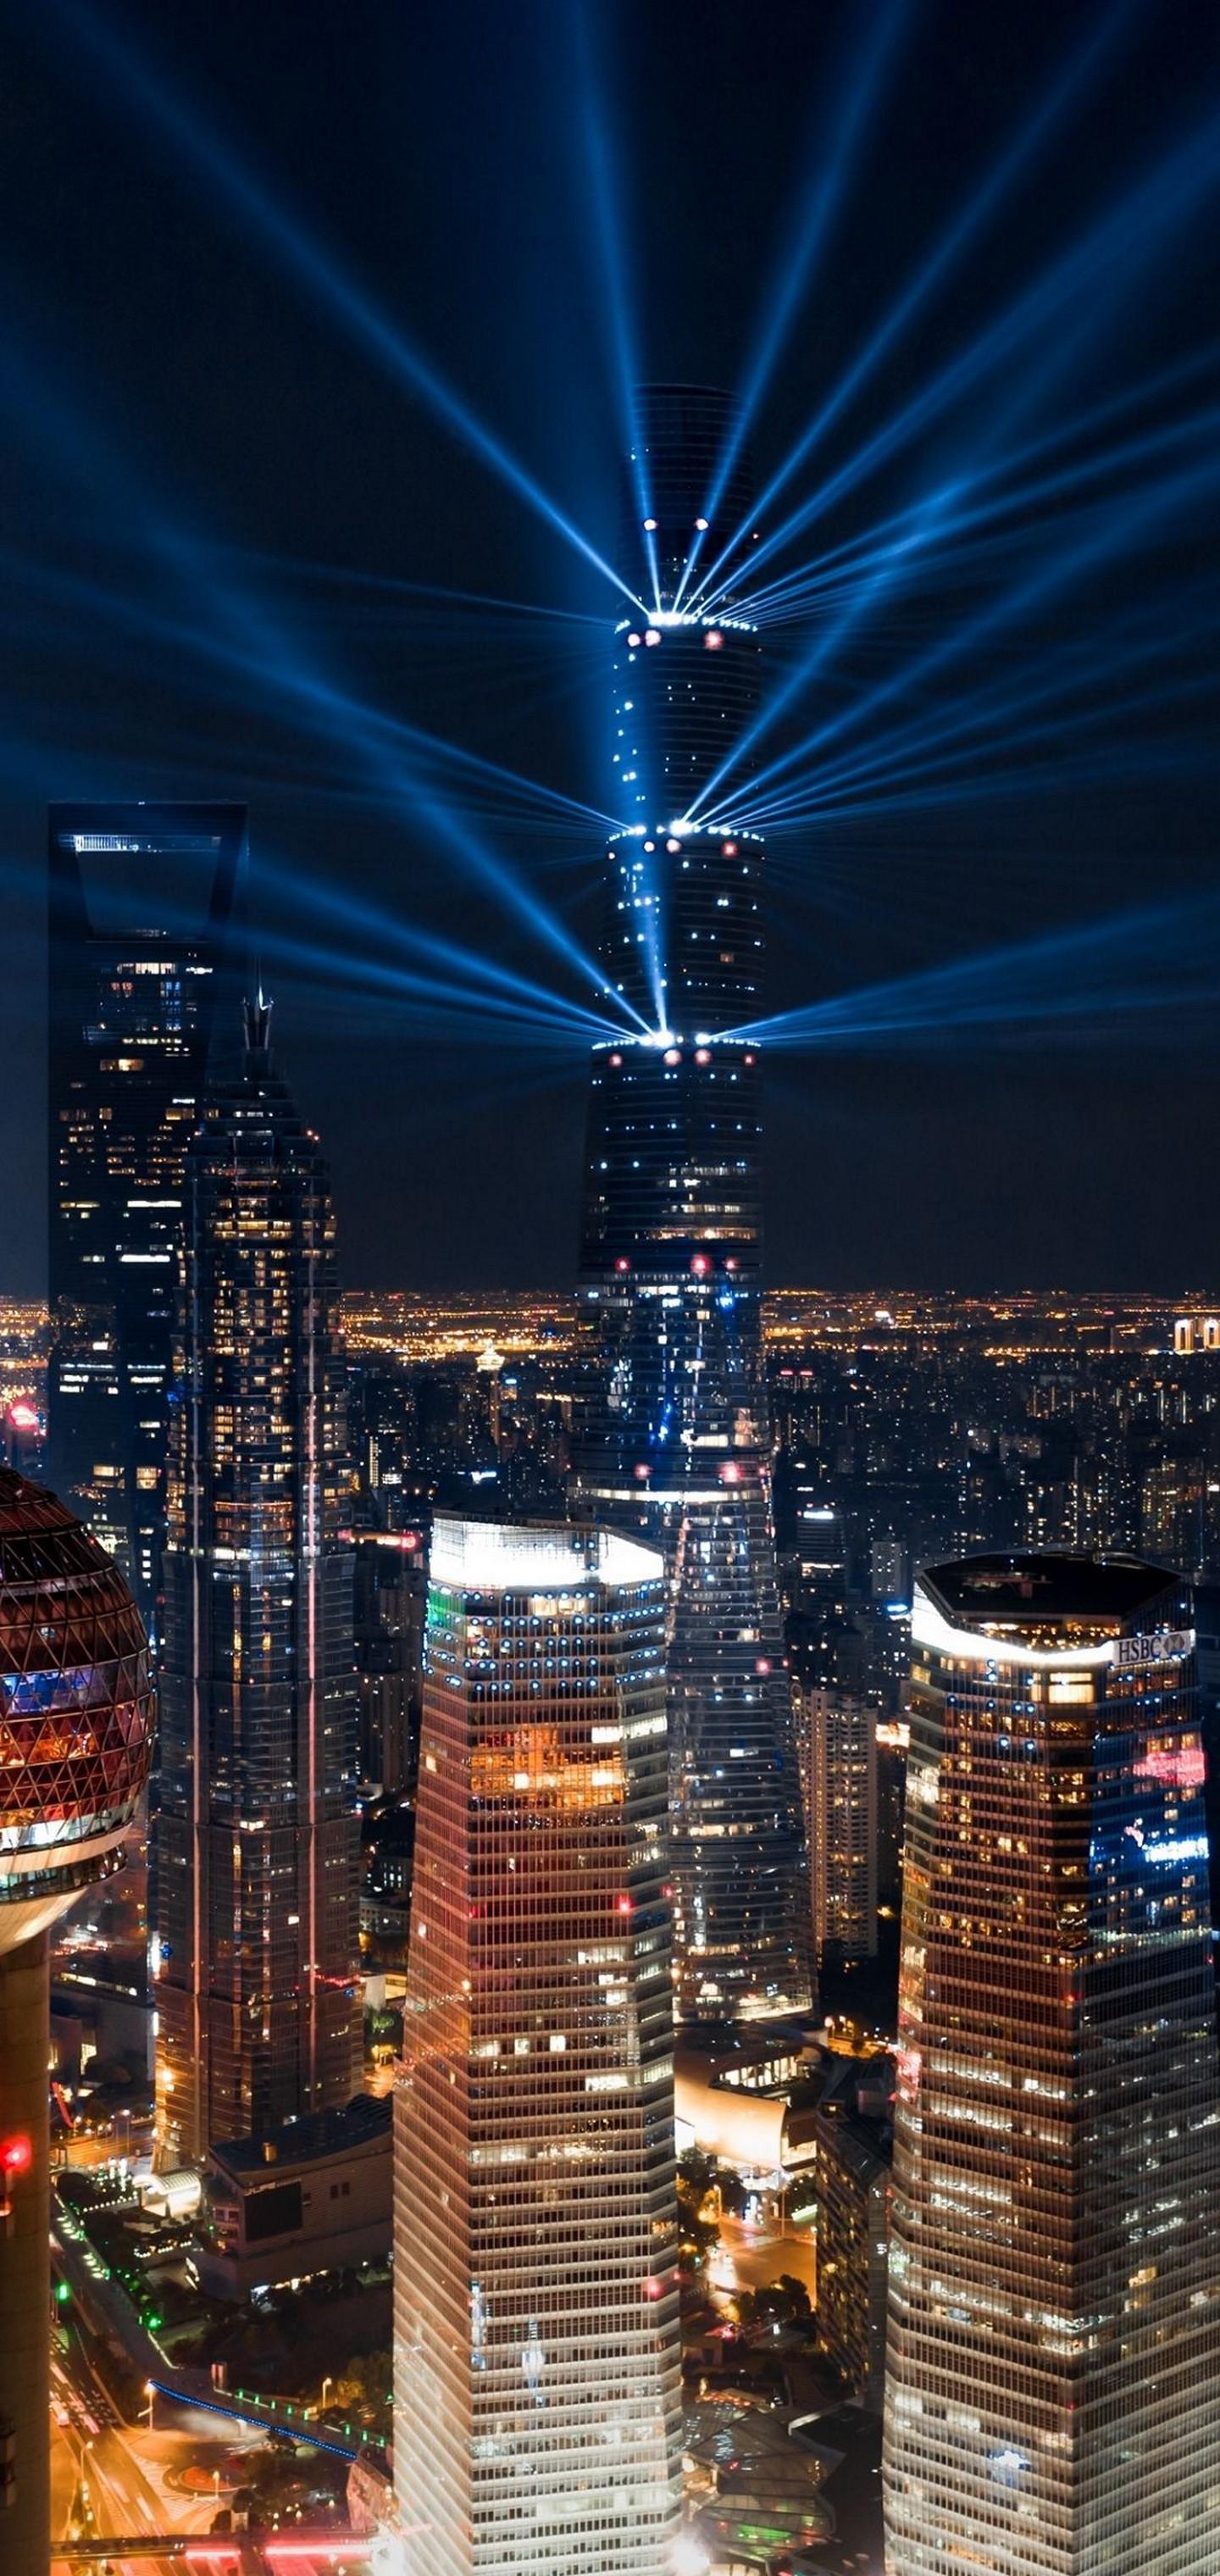 Whatsapp Car Wallpaper Download City Lights Aerial View Wallpaper 1440x3040